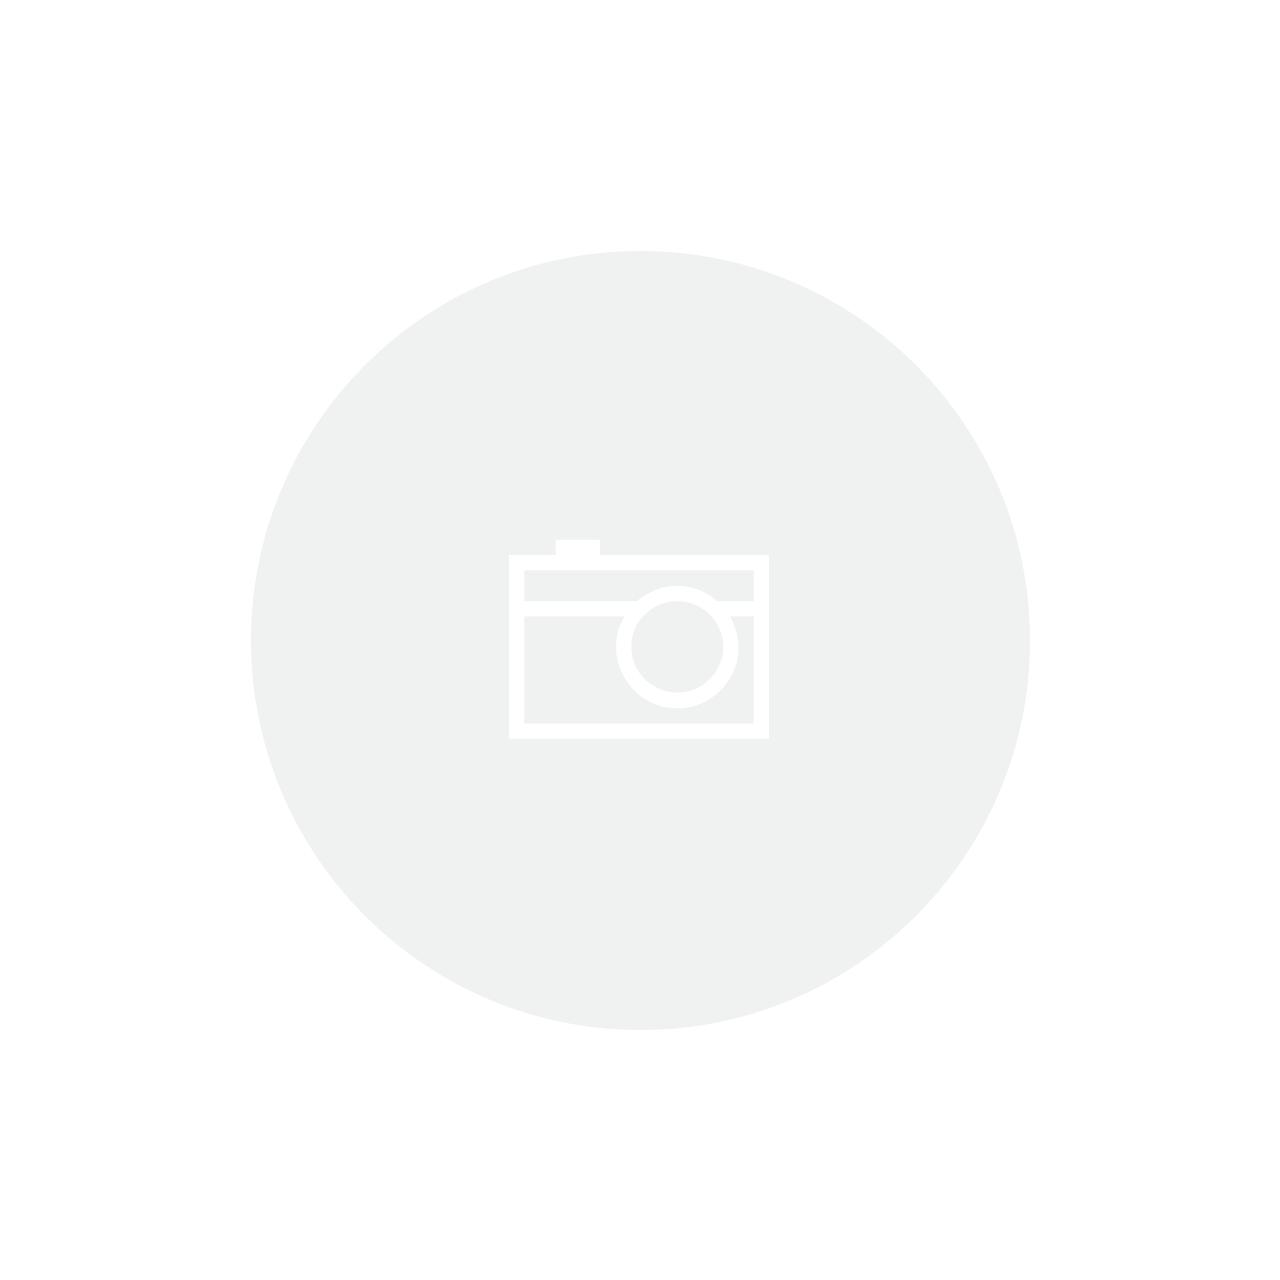 Bandeja Retangular Estilo Dolce Vita Inox 42 cm Tramontina